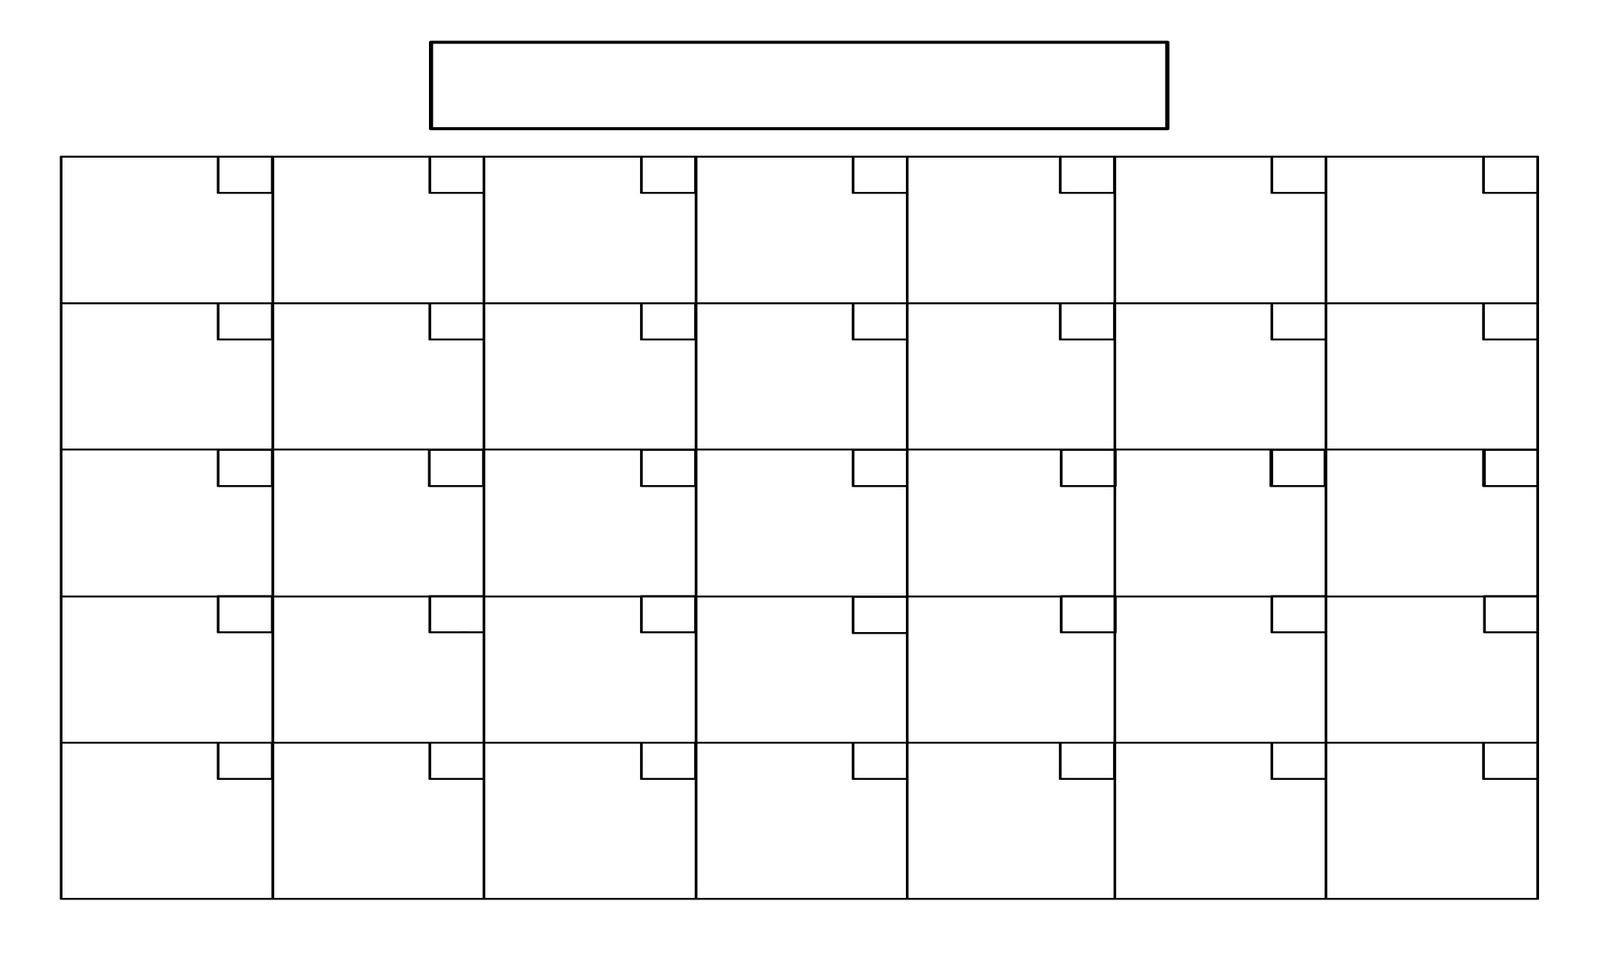 Printable+Full+Page+Blank+Calendar+Template | Boyscout  Printable Full Page Monthly Calendar Blank